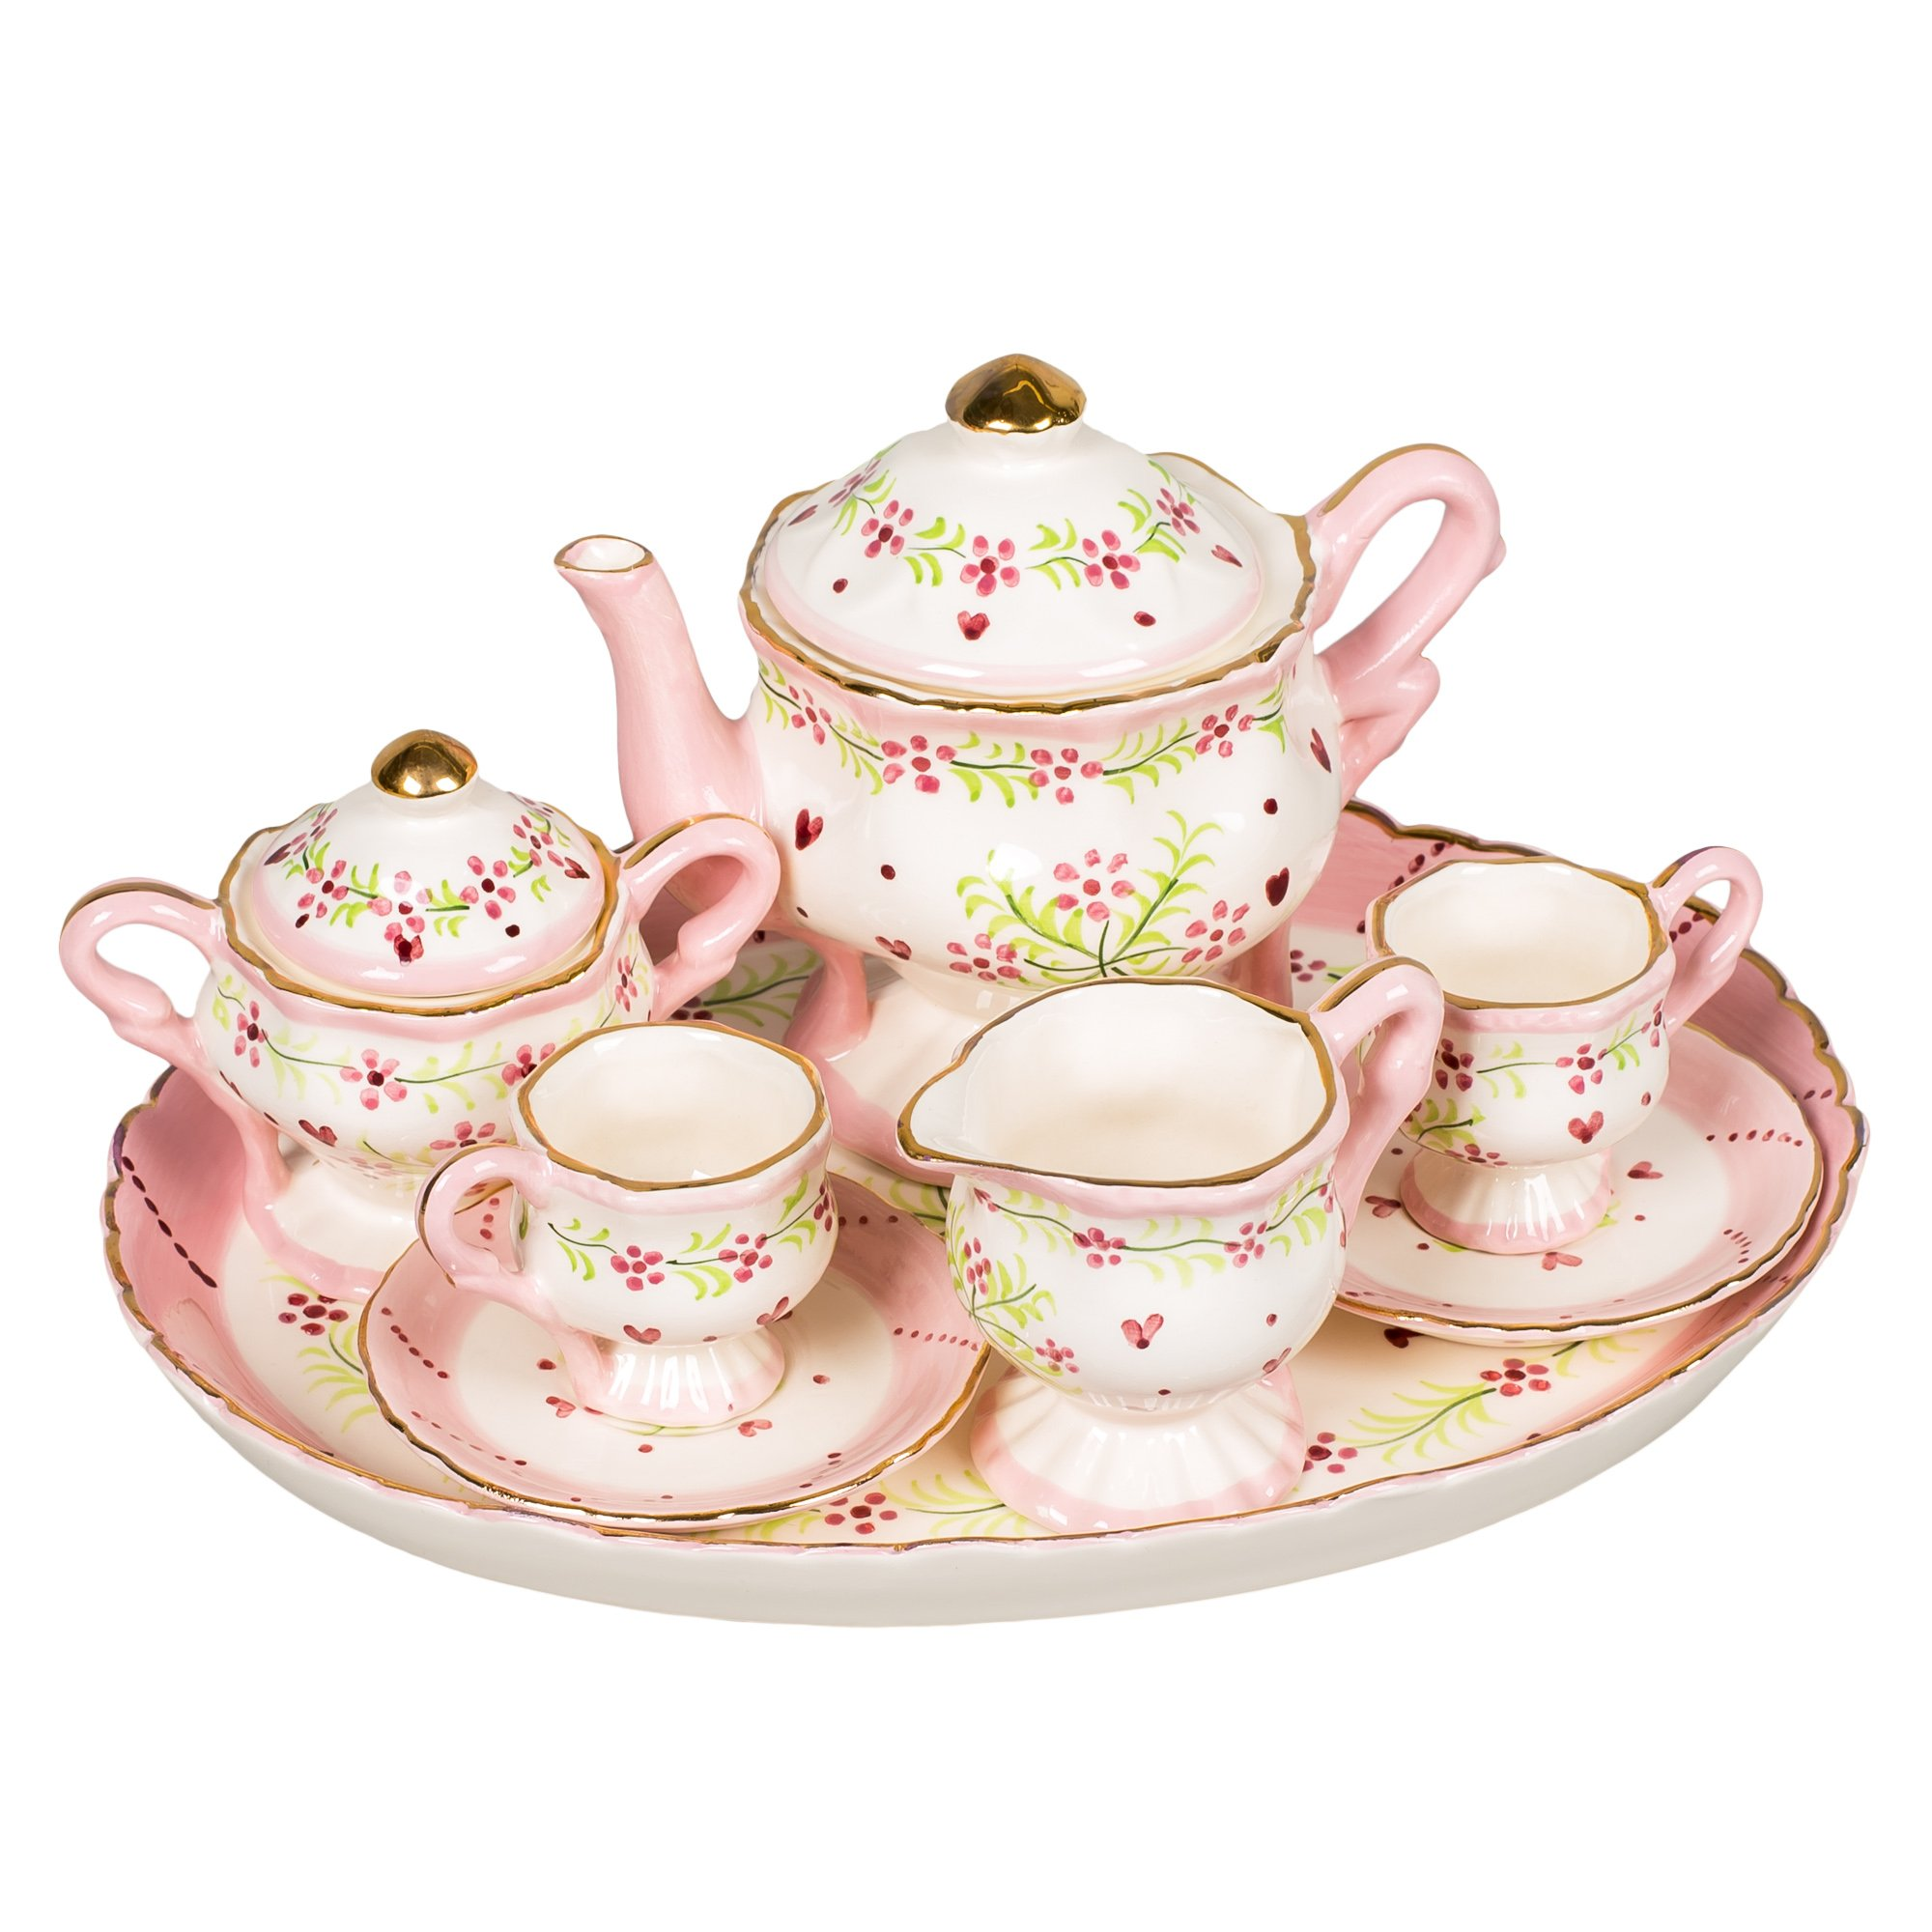 Hearts and Swirls Design White Porcelain Children's Tea Party Set